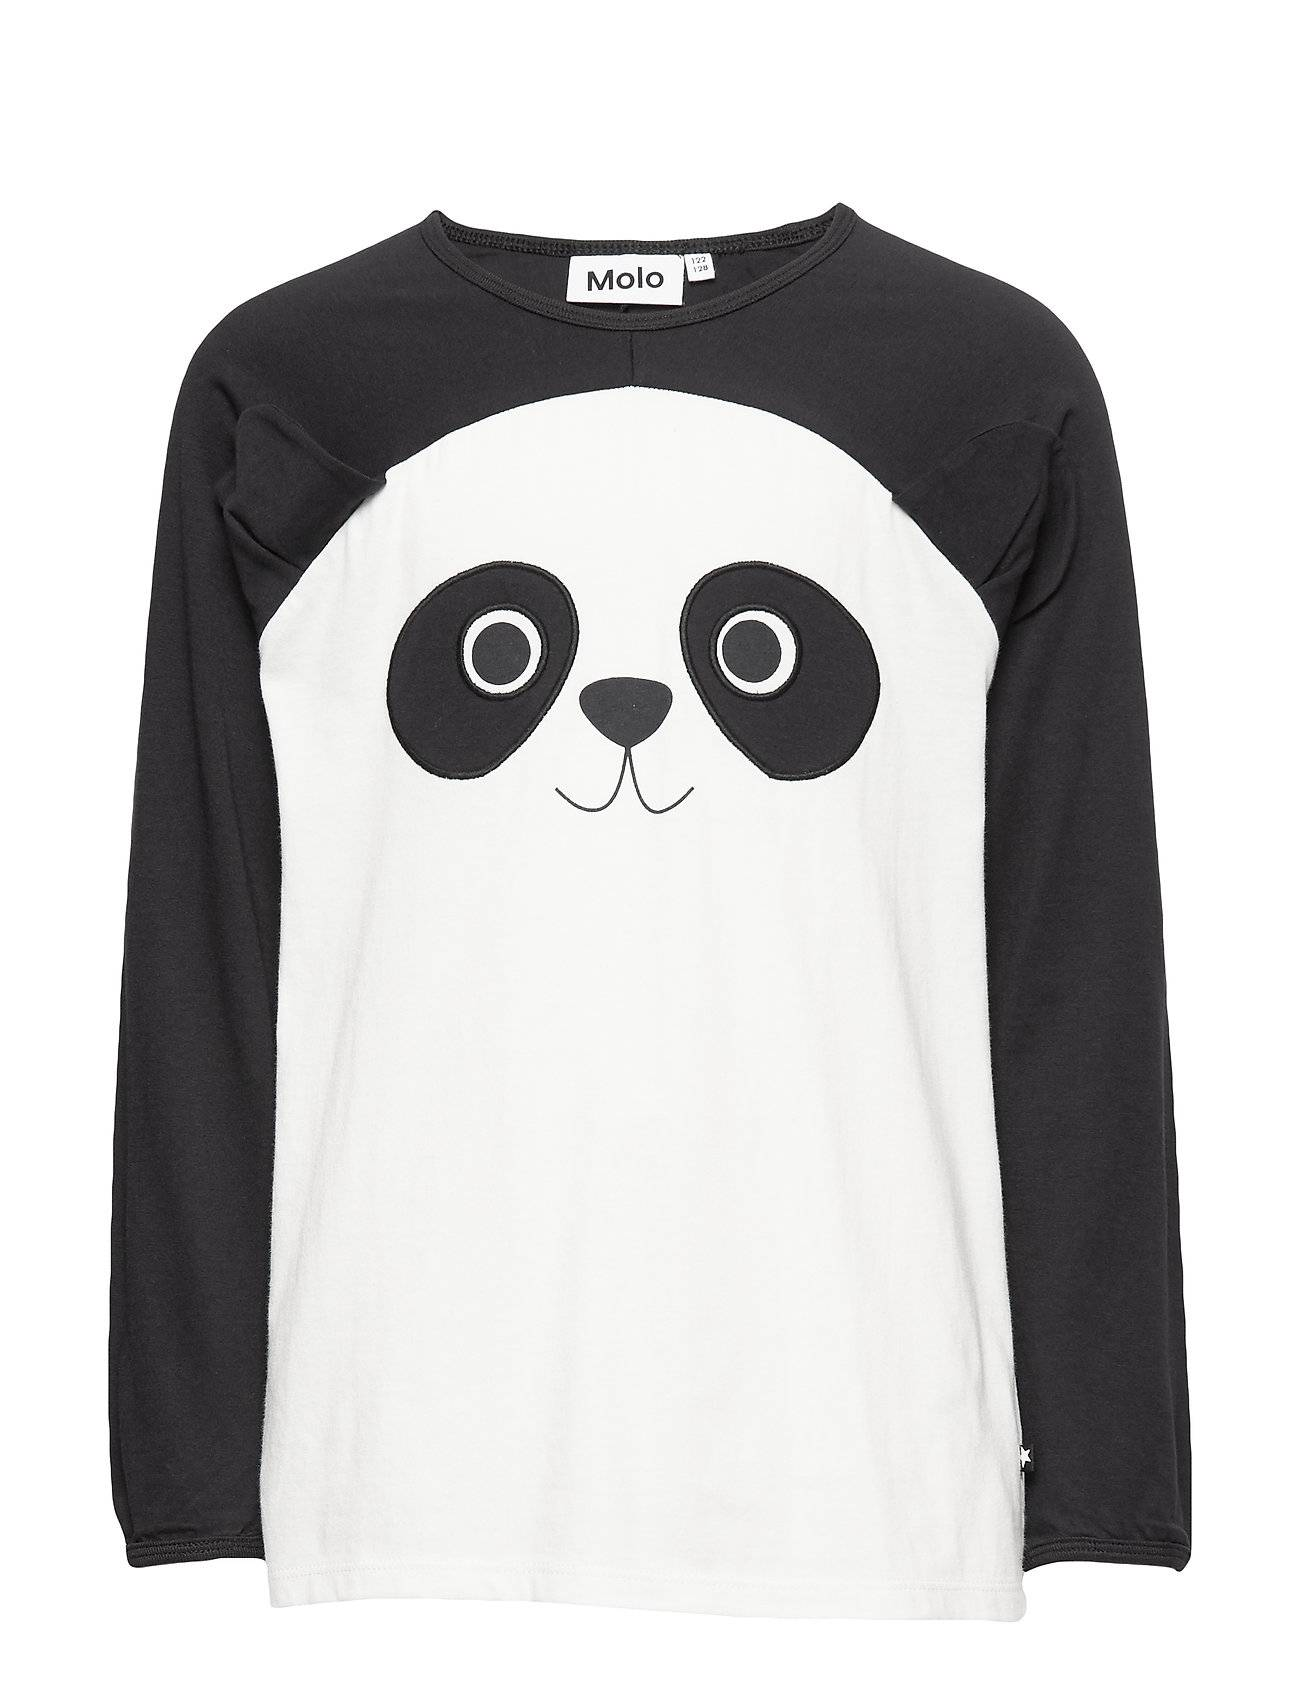 Molo Linni T-shirts Long-sleeved T-shirts Musta Molo